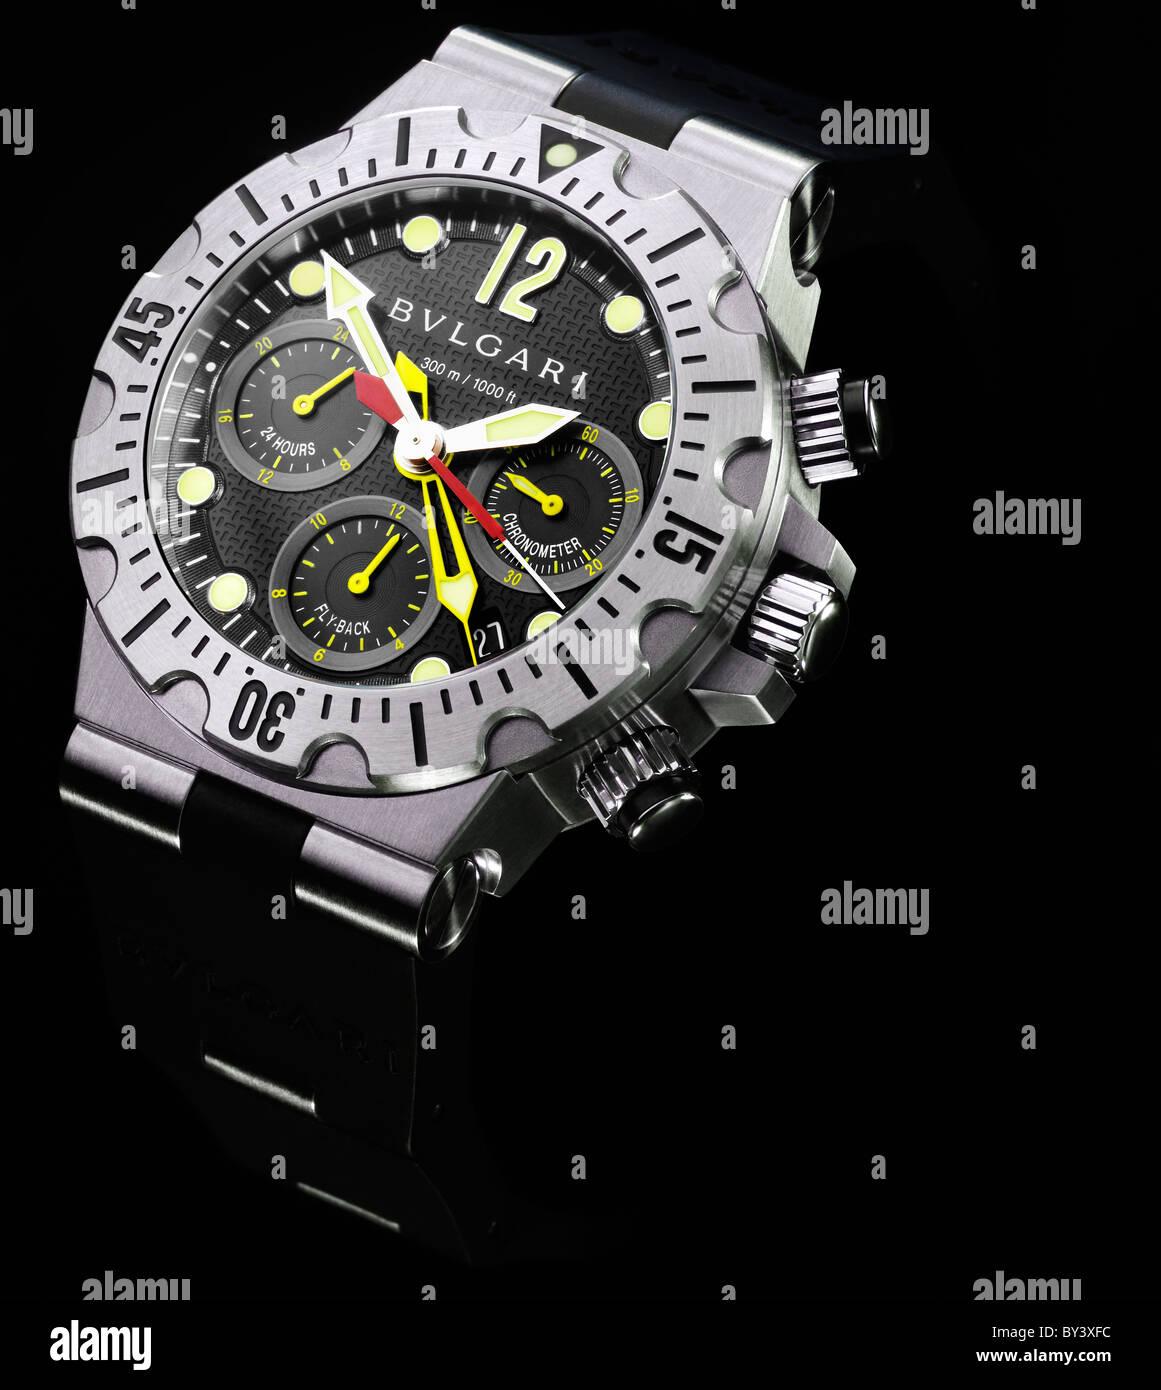 Designer Watch Stock Photos Images Alamy Fossil Bridgette Mini Stainless Steel Am 4352 Bulgari Bvlgari Wrist Image